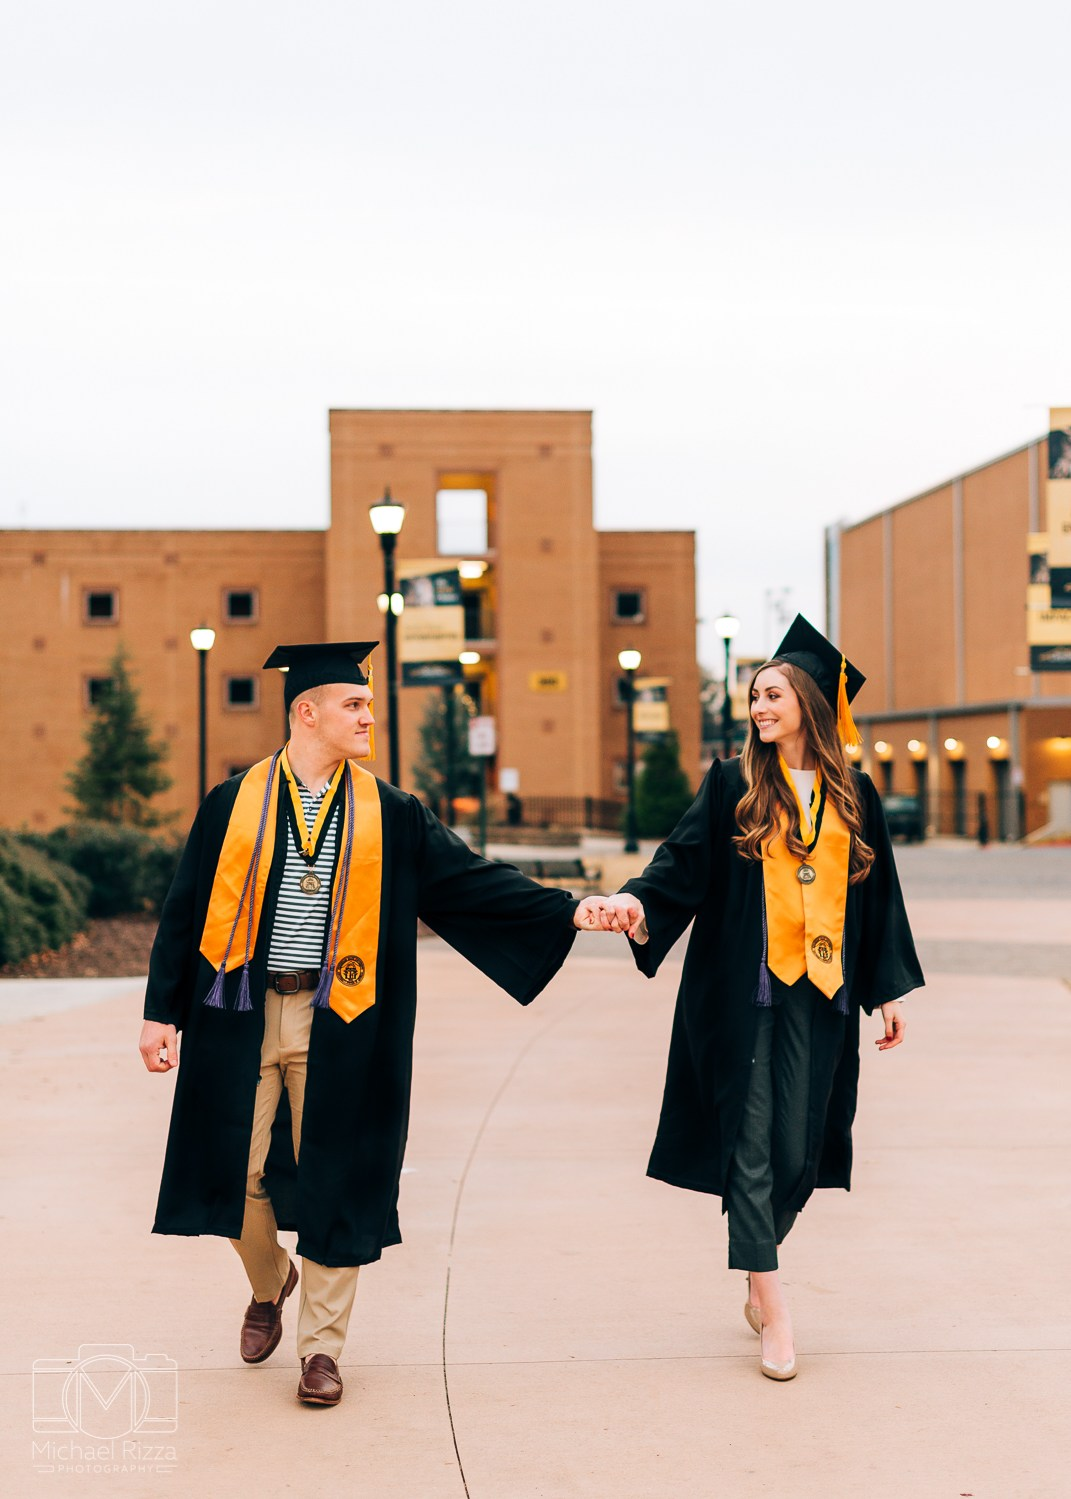 Kennesaw State University Grad Photos, KSU Grad Portraits